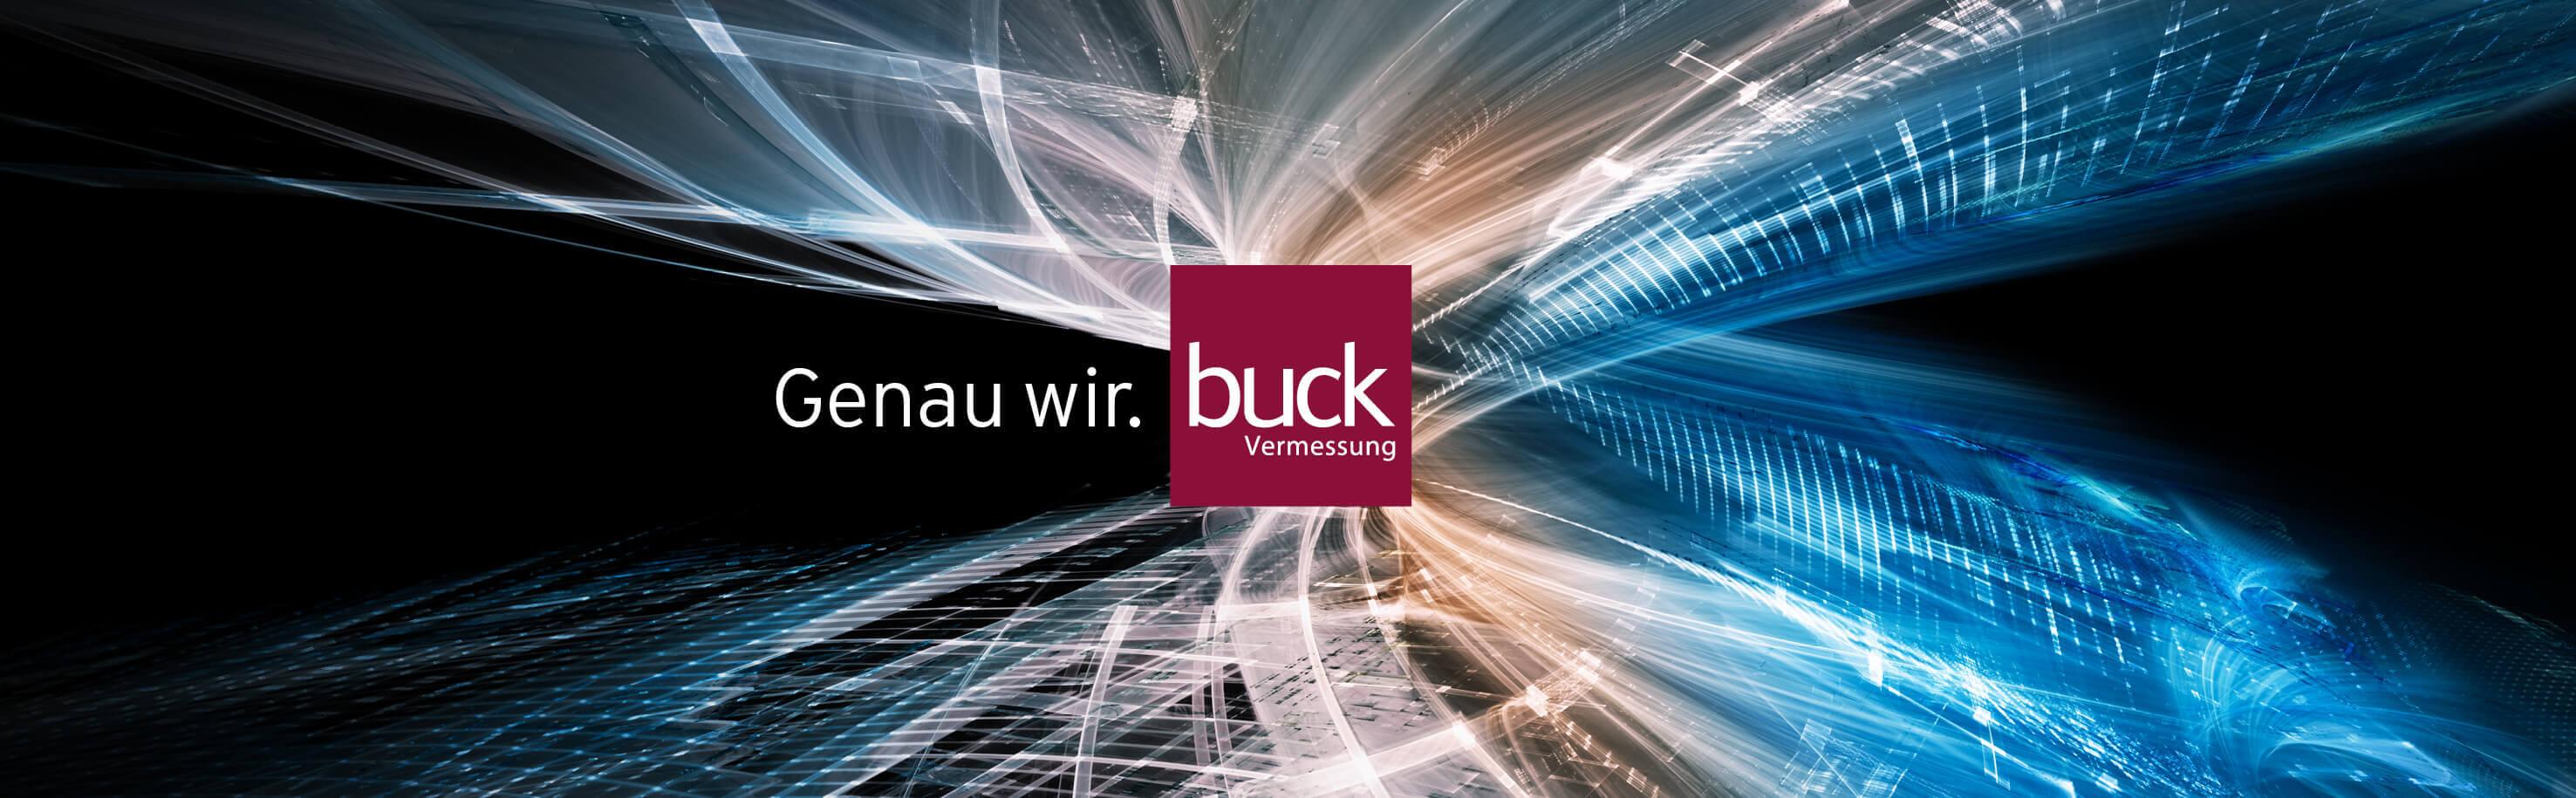 buck blog